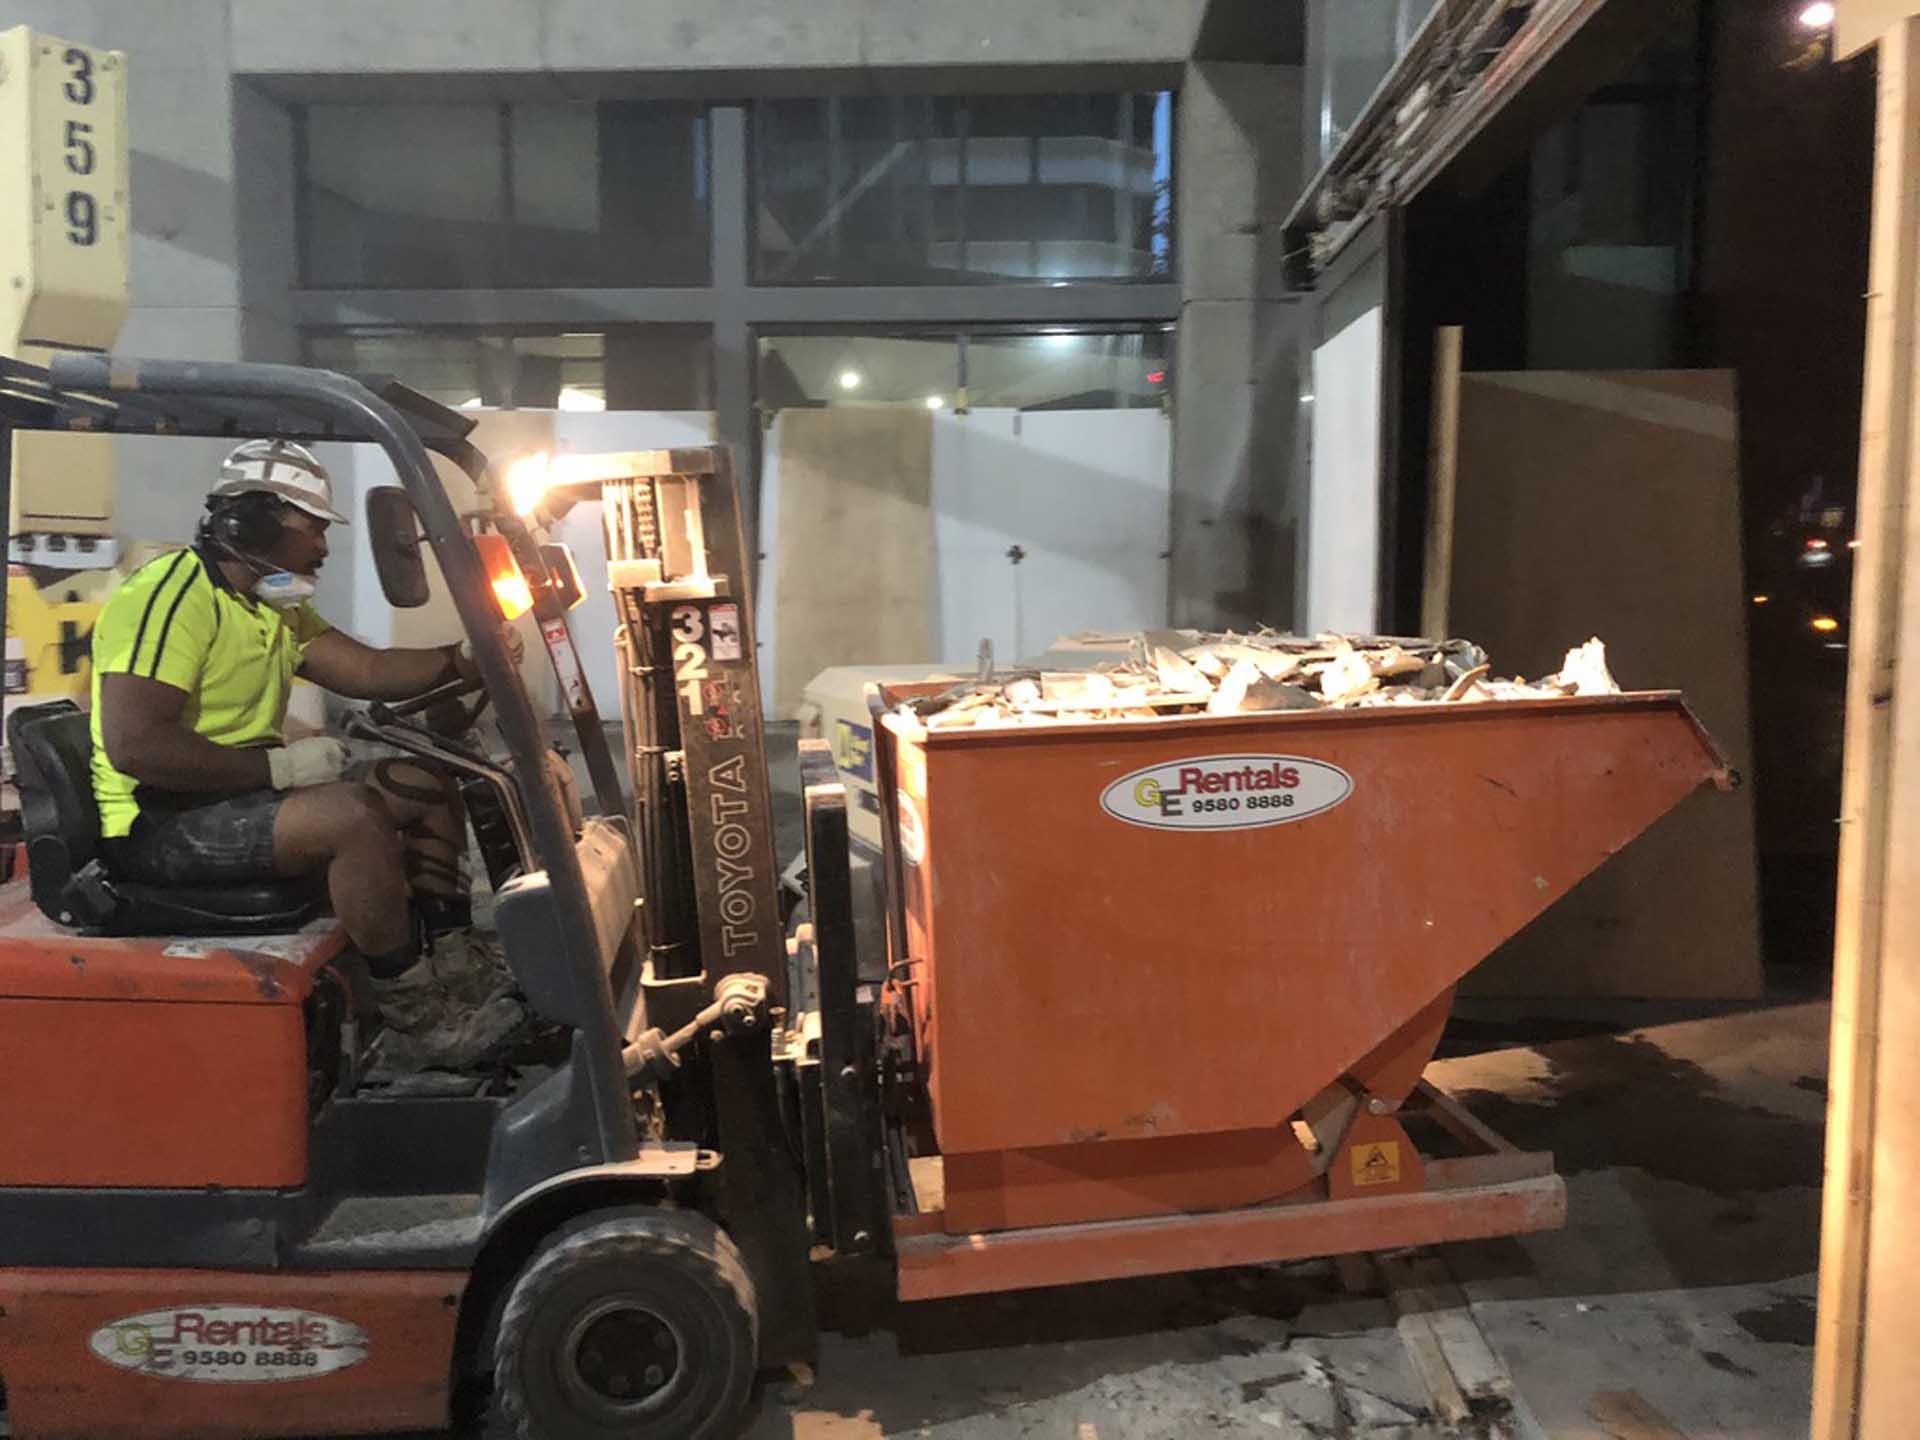 Bourke St Melbourne commercial demolition